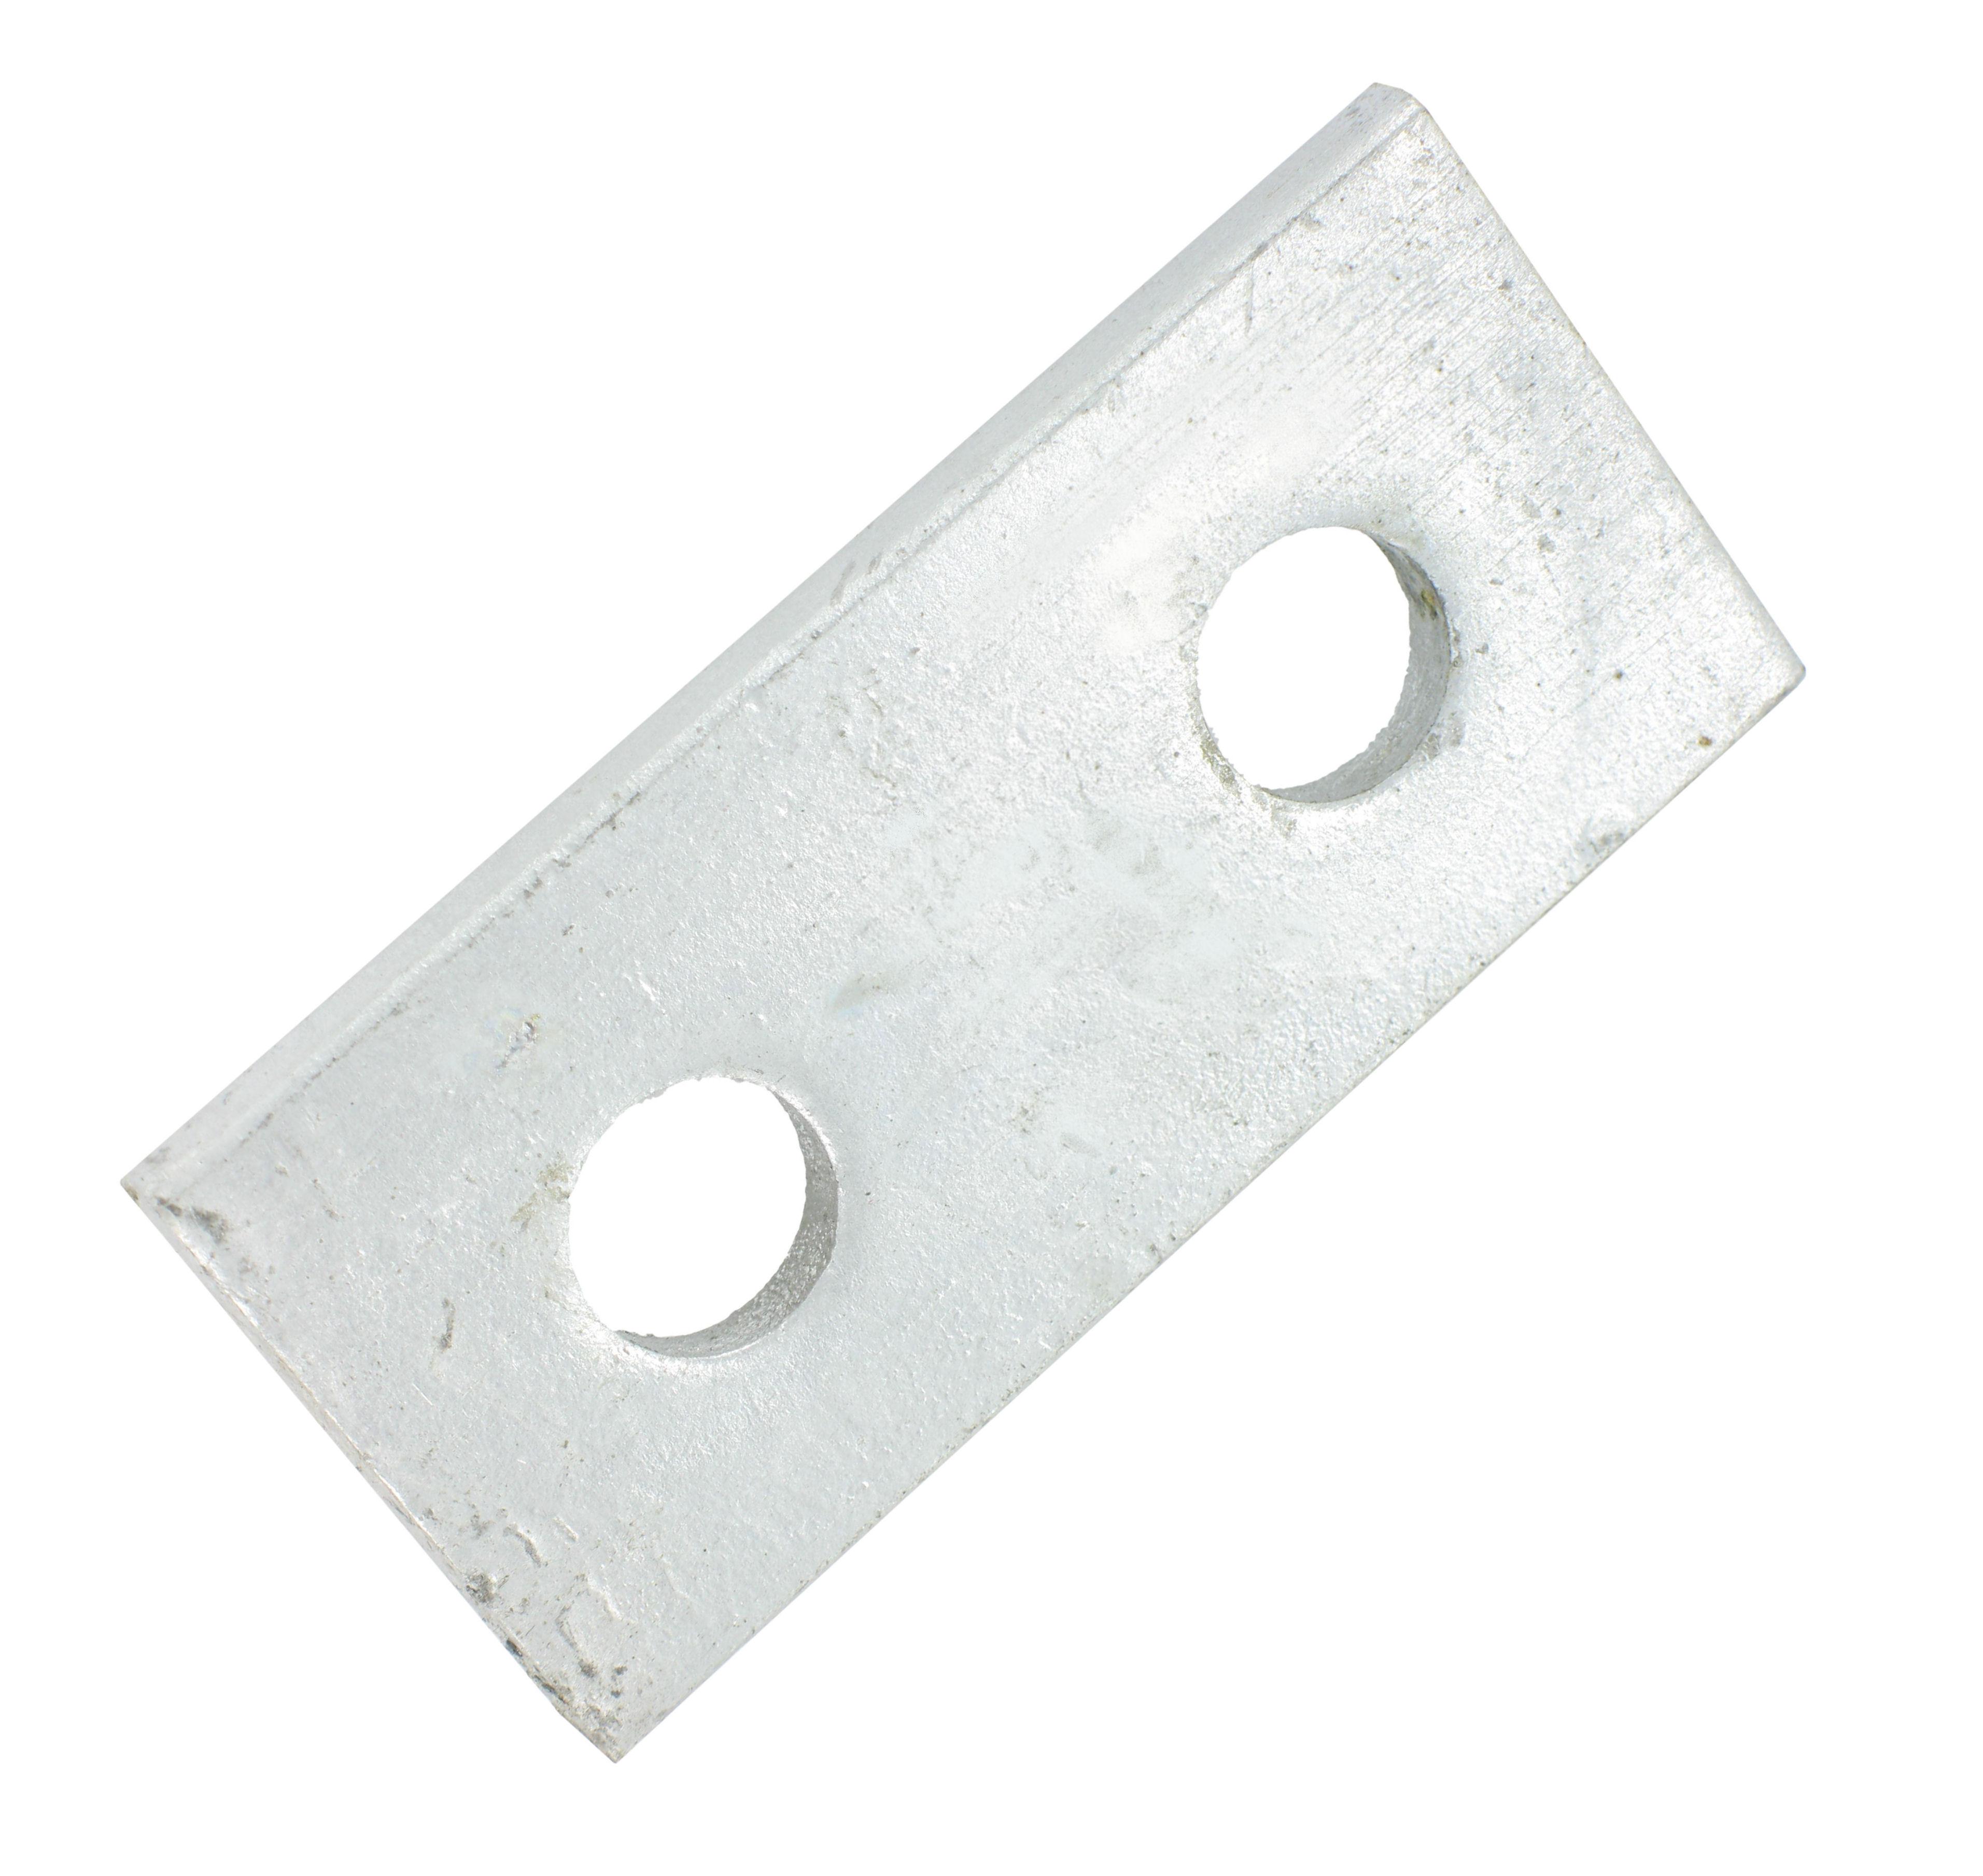 Deligo D507 Splice Plate 2 Hole Galv